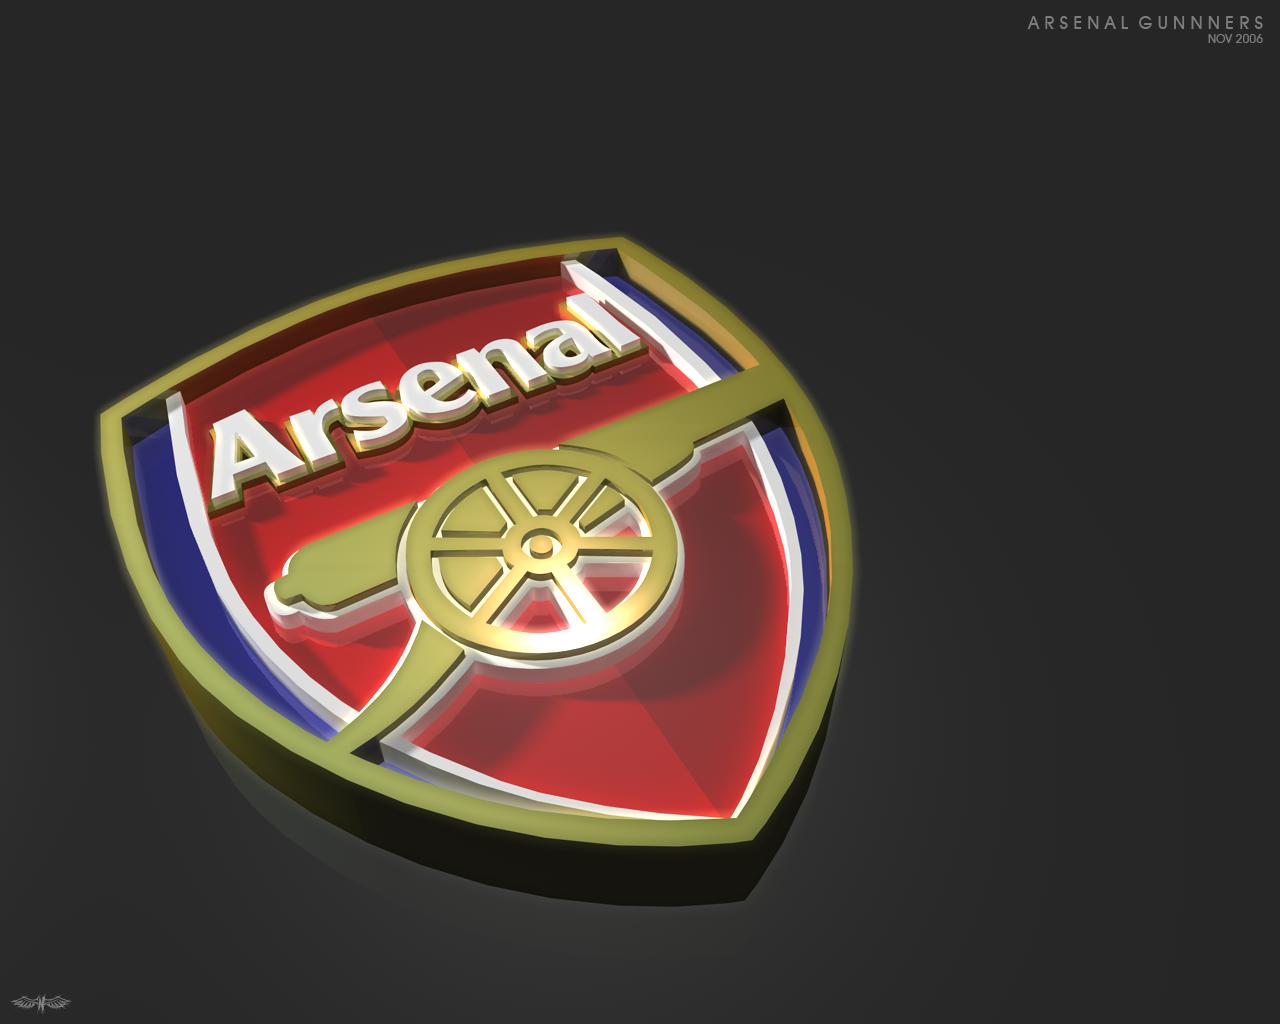 Kumpulan Arsenal Wallpaper Android Market